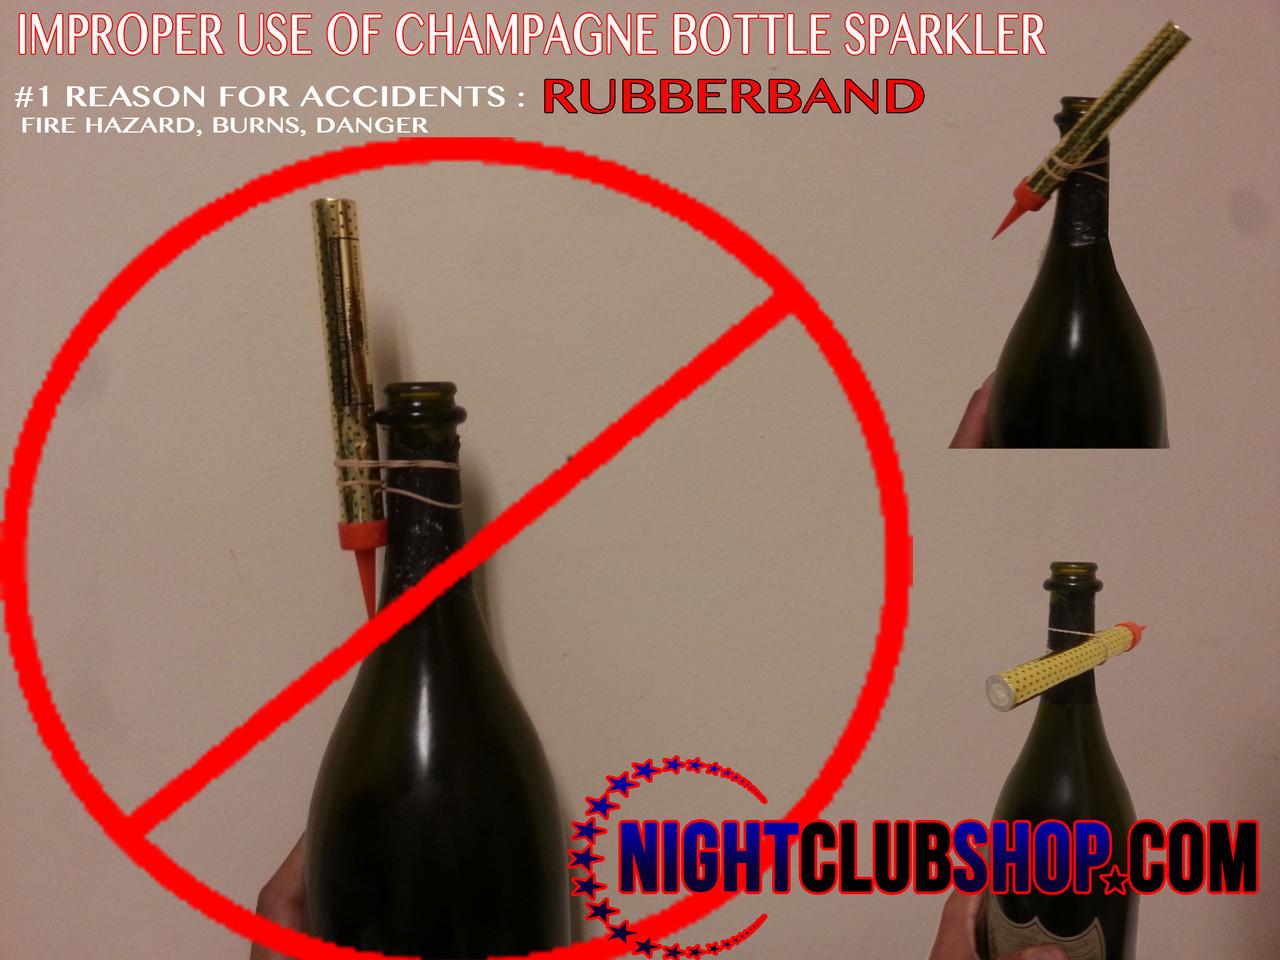 triple, clip, triple clip, three sparkler, clip, hold, bottle sparkler, champagne, bottle, neck , safety, safe, bottle neck, stretch, holds, wholesale, bulk, plastic, champagne, bottle sparkler